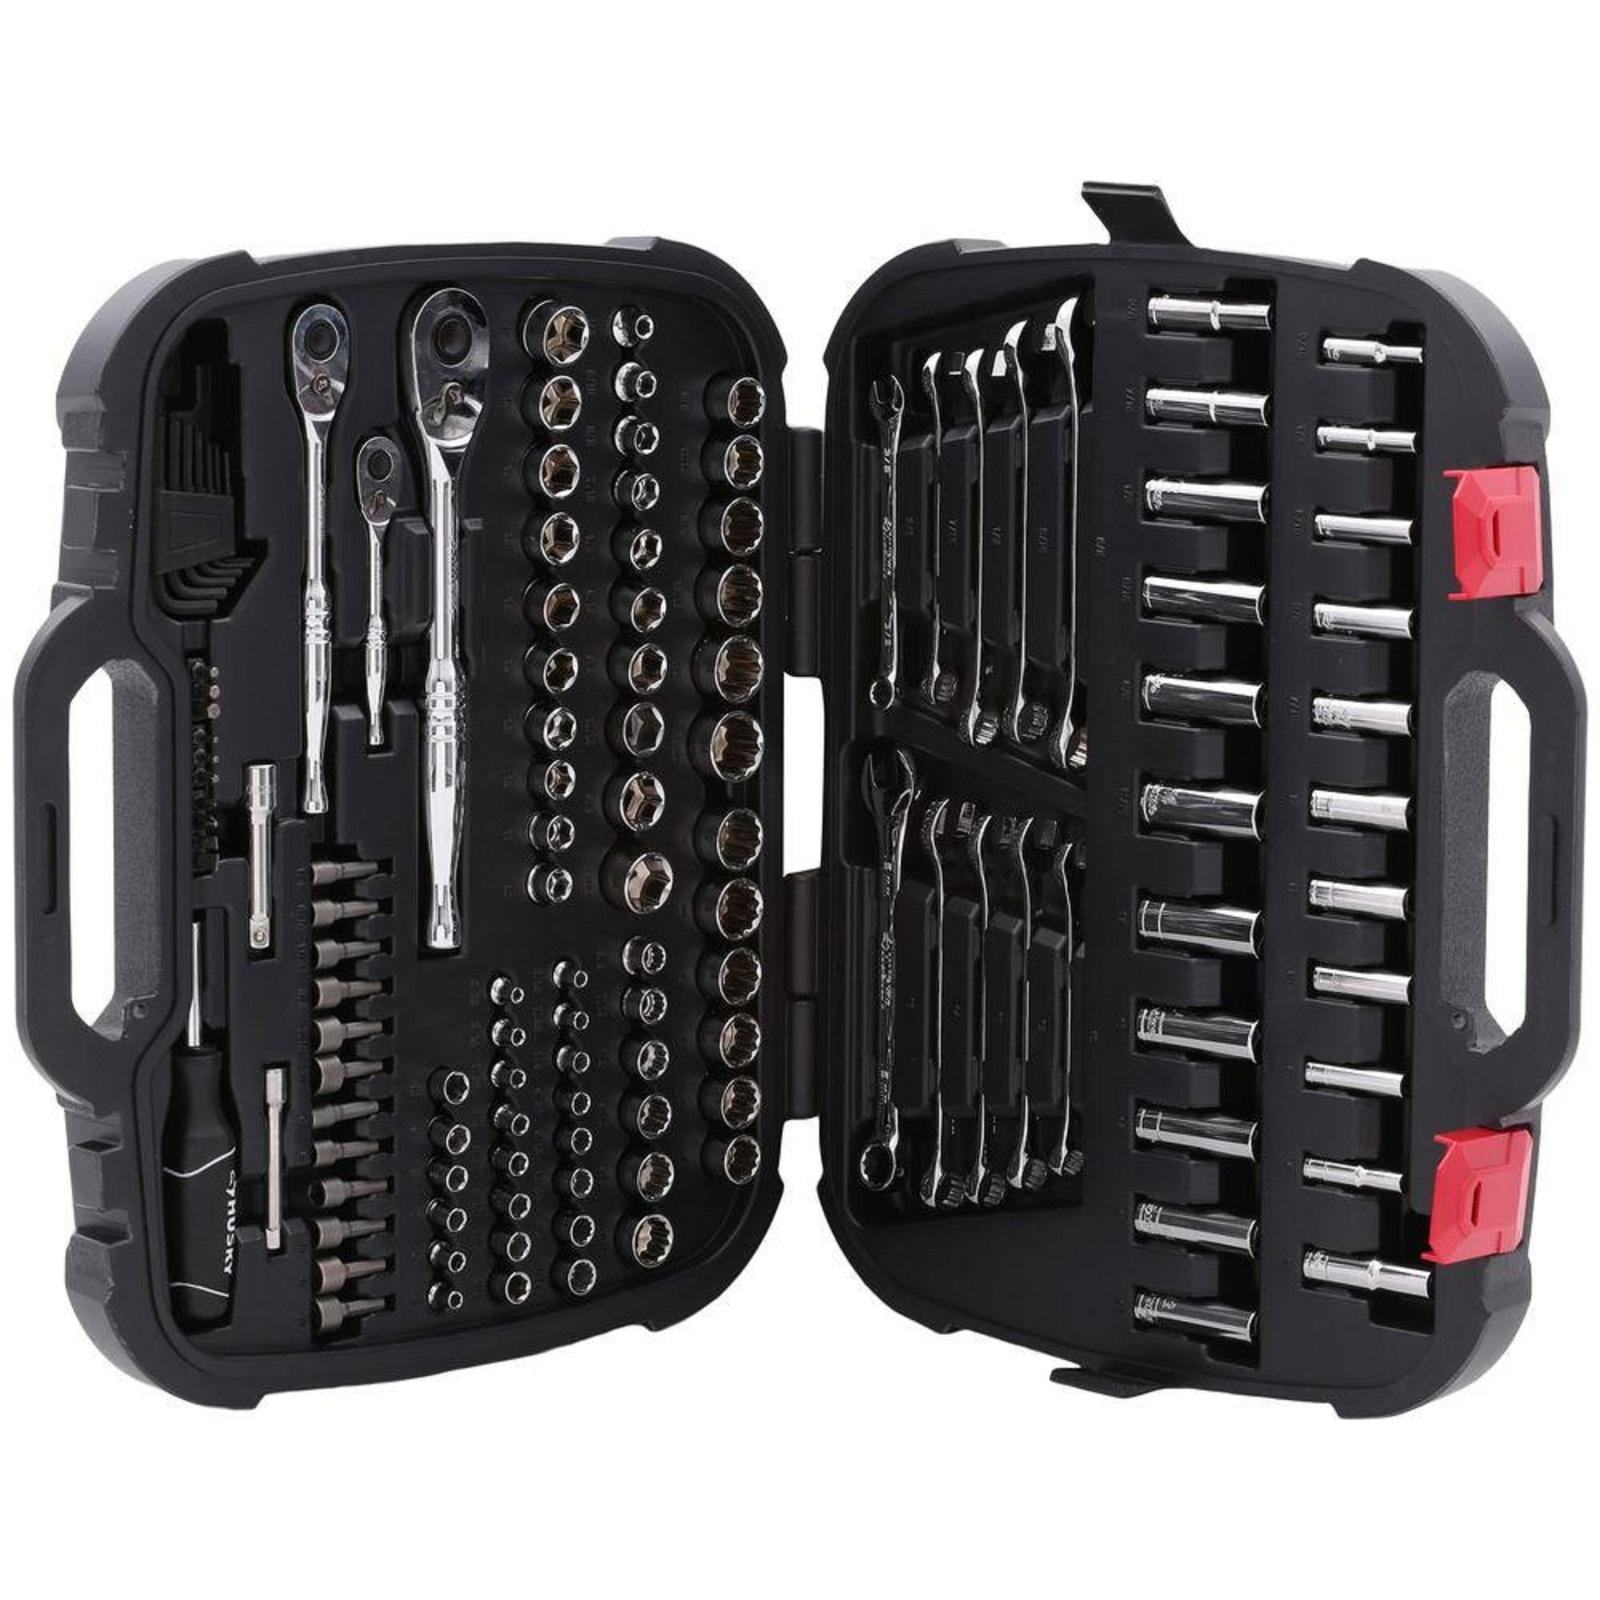 Mechanics Tool Set 134 Piece Socket Ratchets Wrenches Accessories Garage Repair